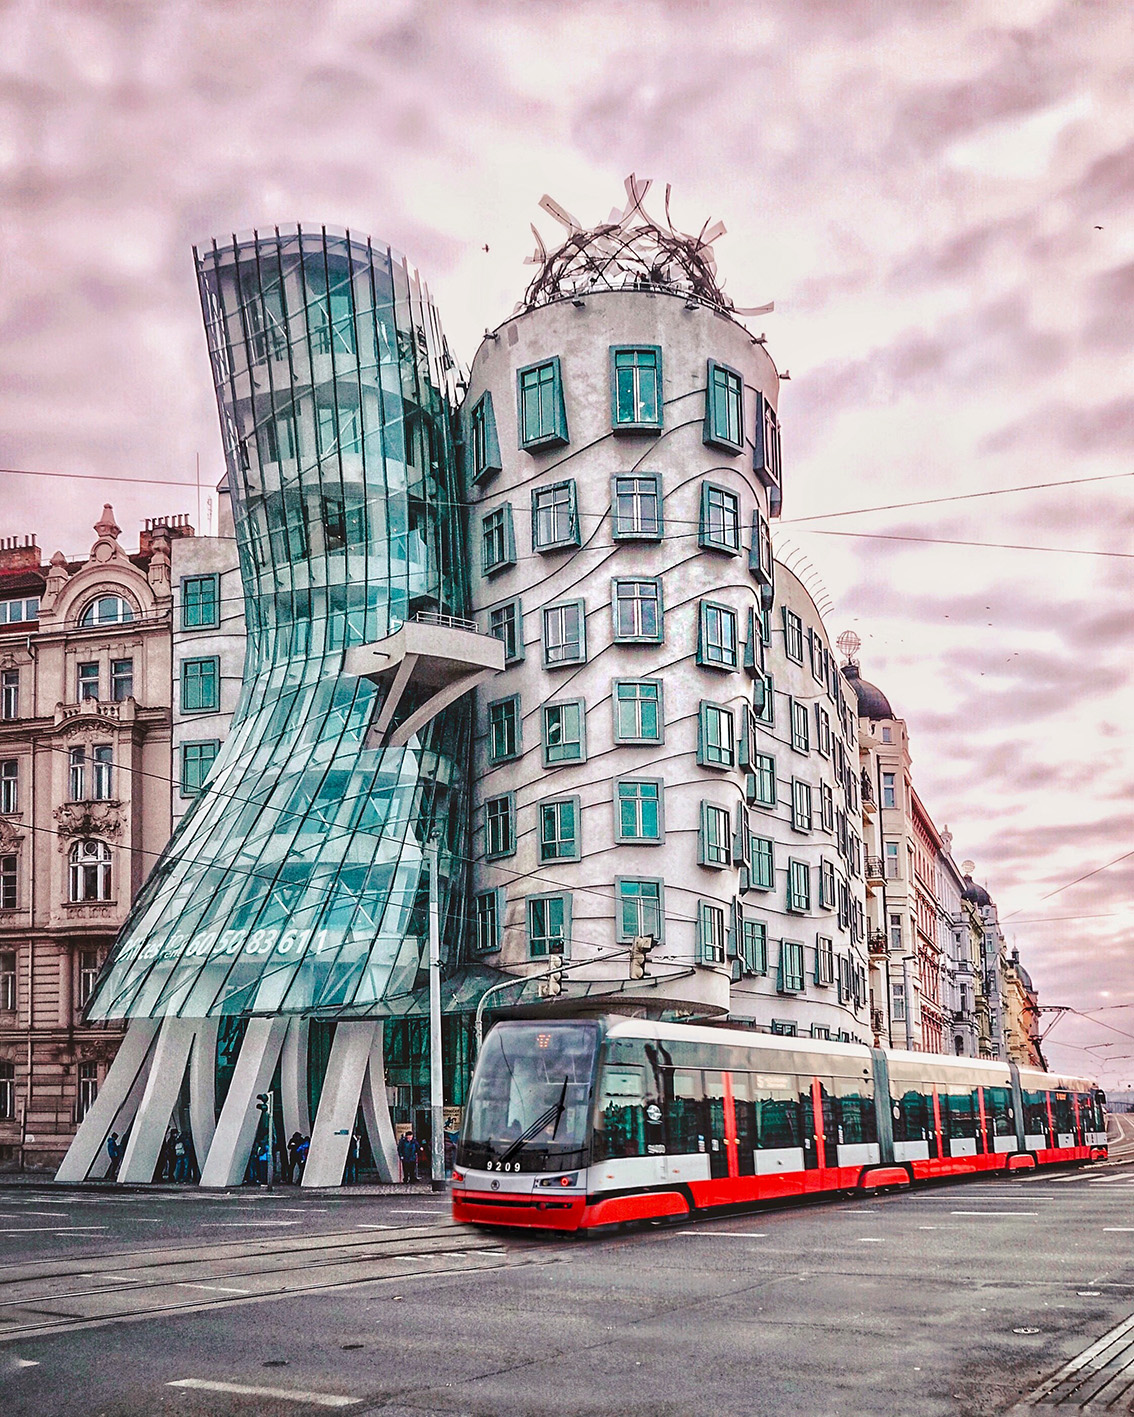 29 Weekend a Praga: 7 cose da vedere, dove dormire, gli indirizzi food e i Mercatini di Natale più belli.